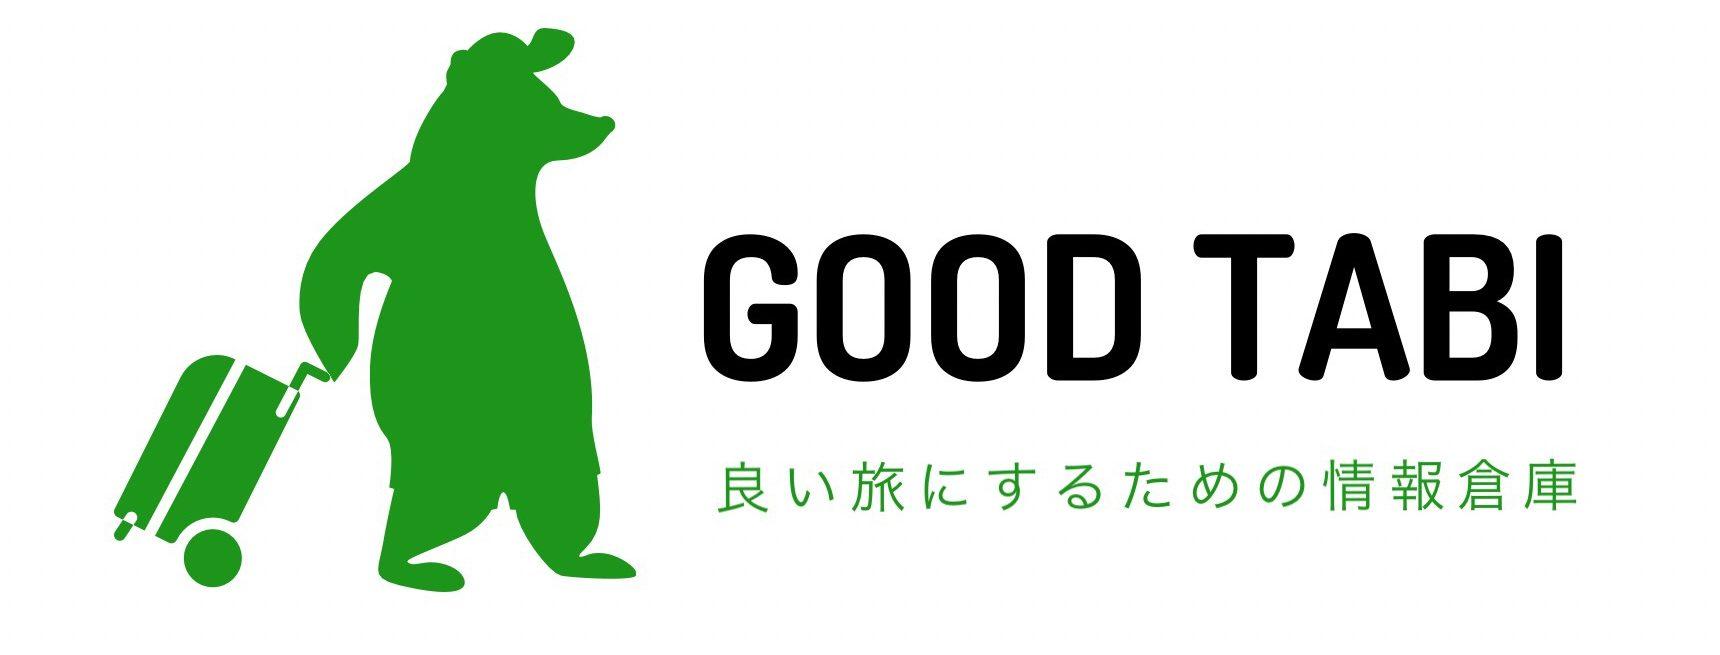 Good Tabi -グッたび-